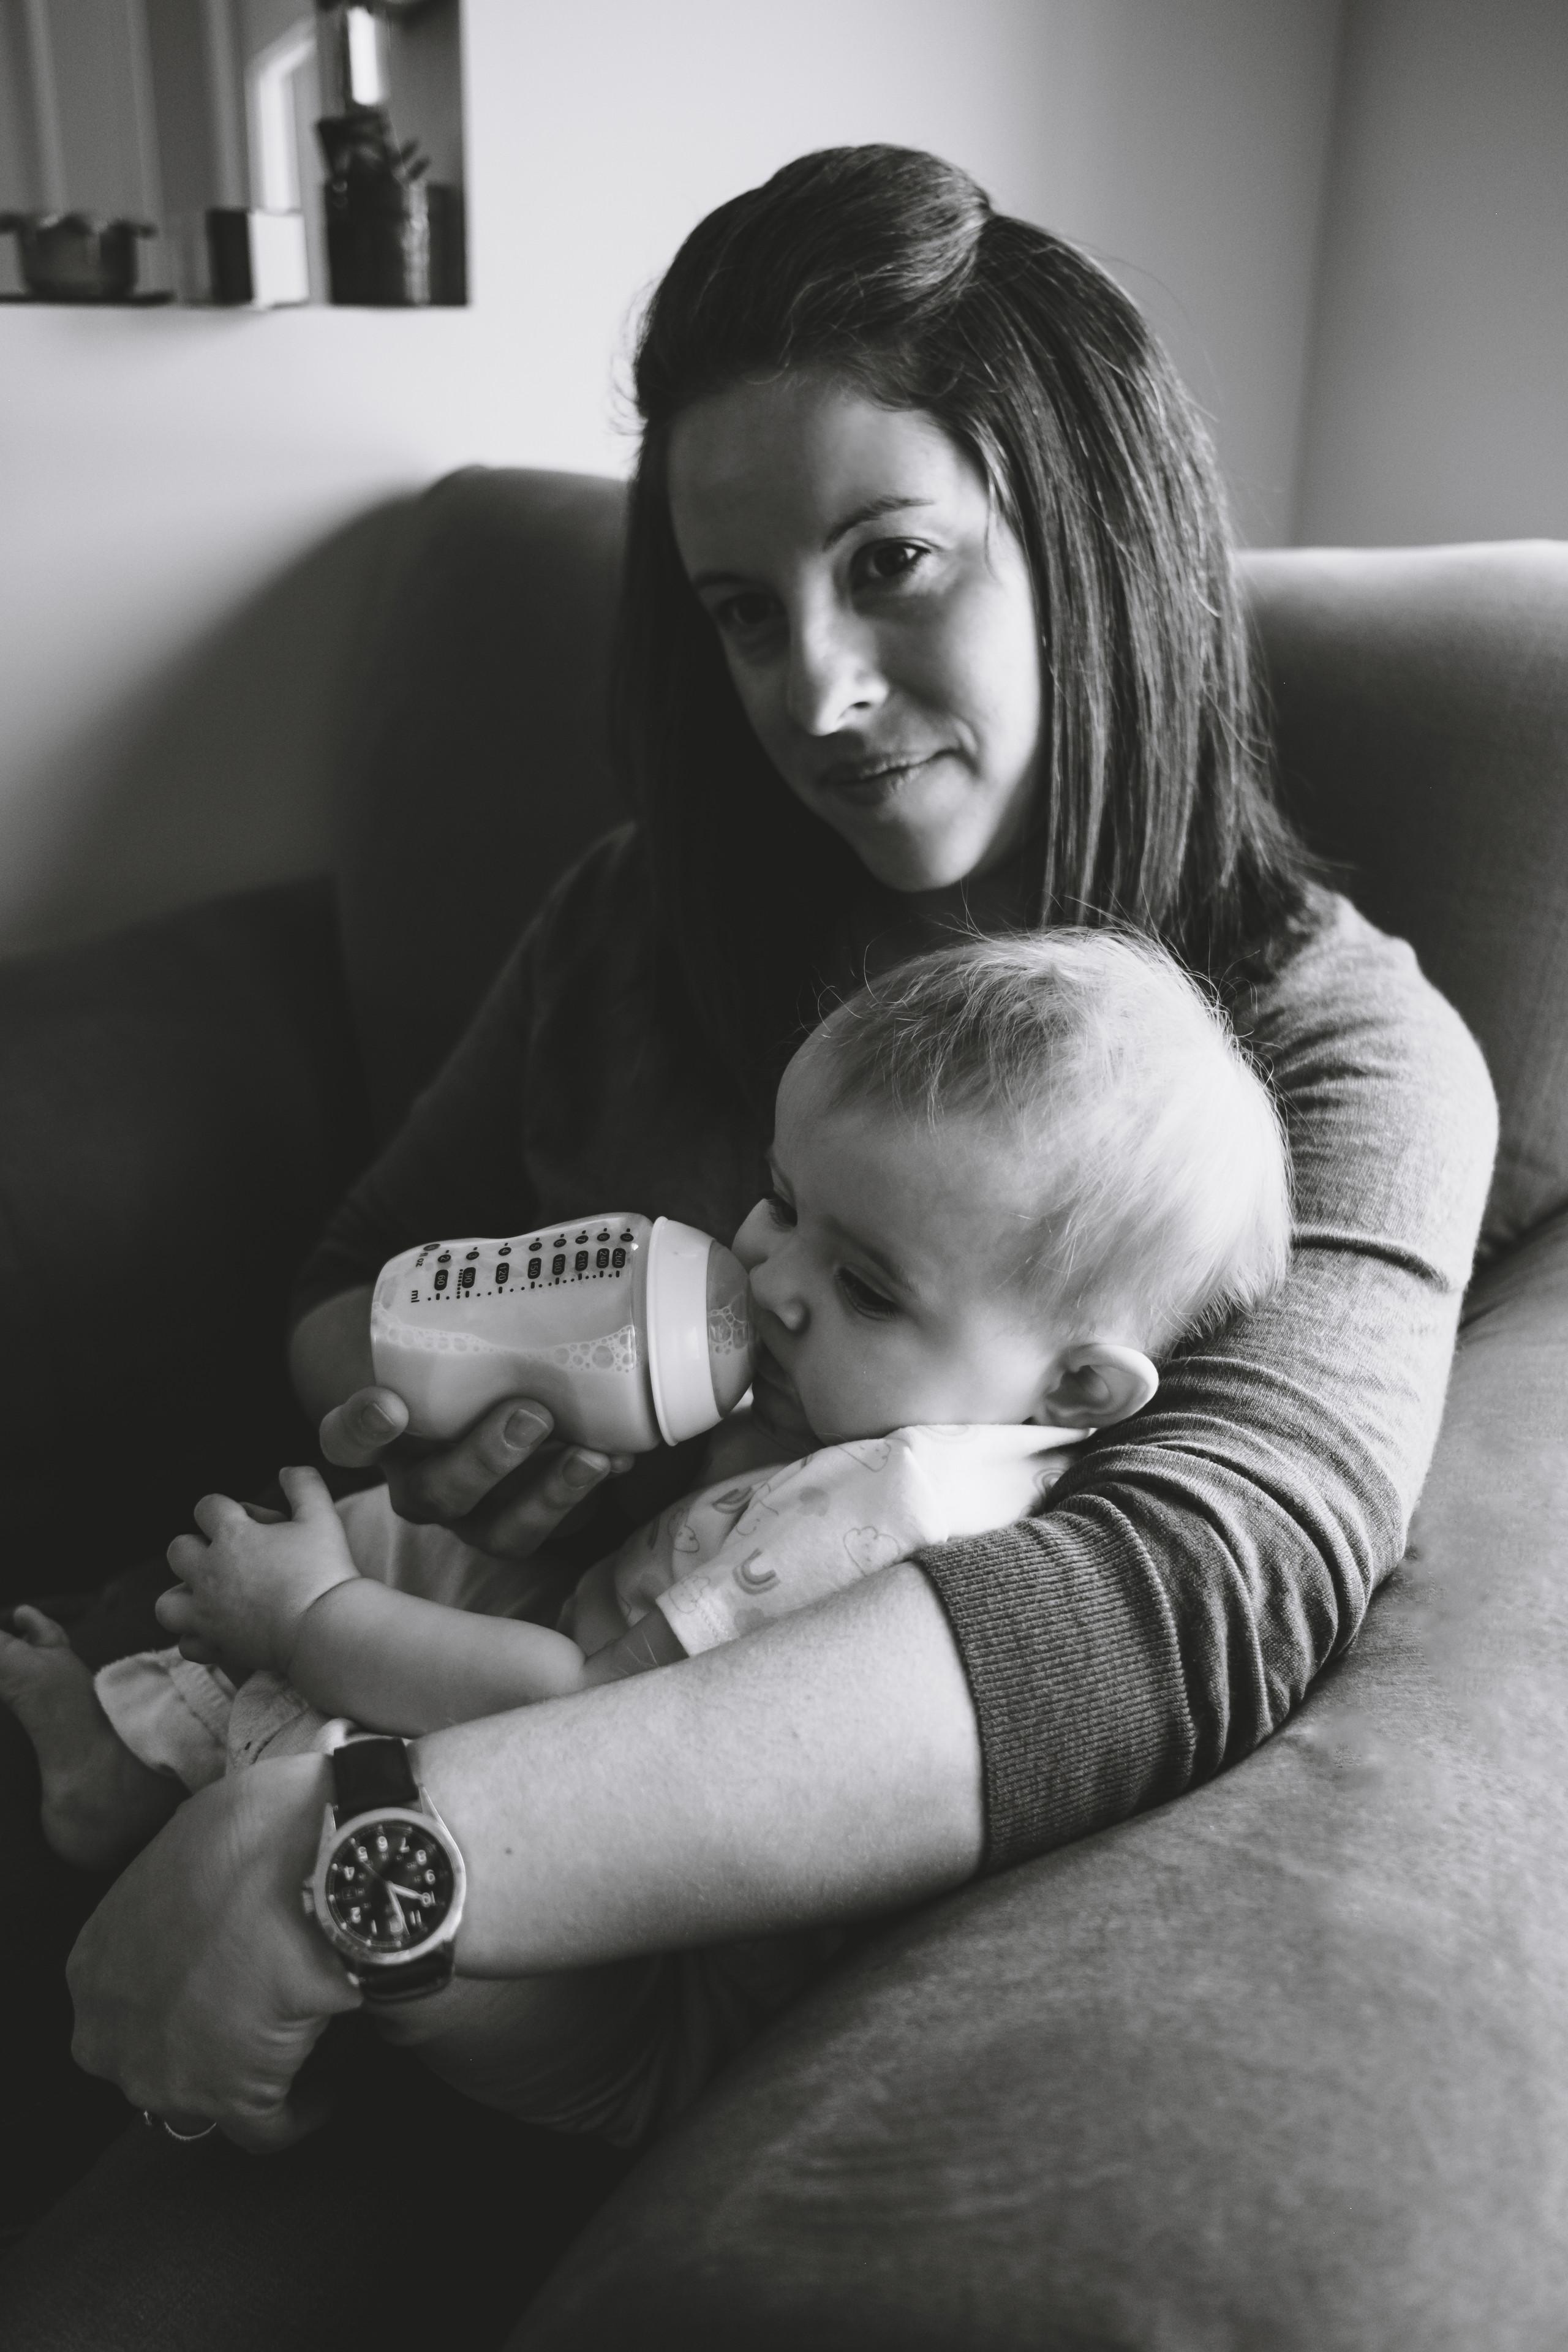 photographe gatineau, ottawa photographer, family photos ottawa